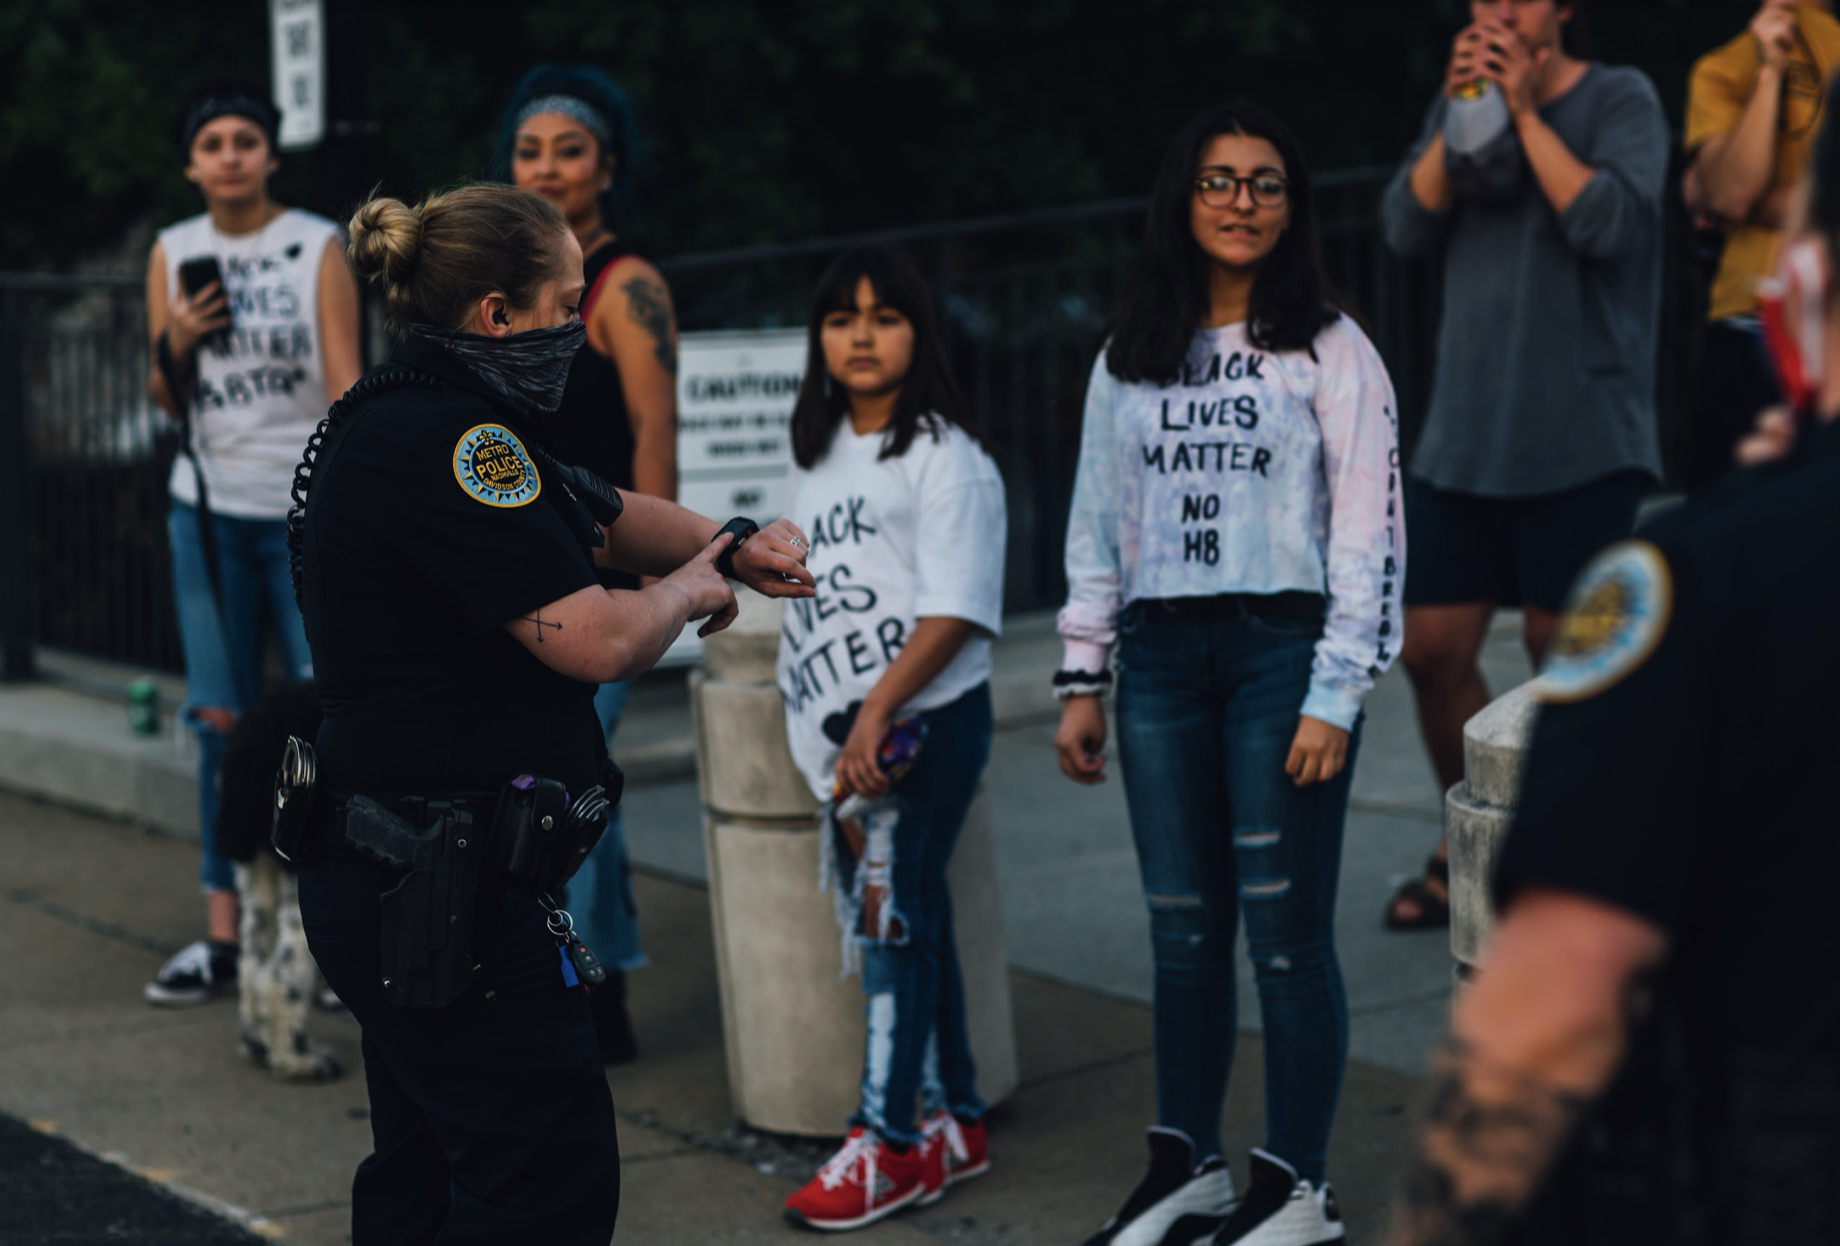 Nashville, Tenn., May 31 - A Metro police officer tells protestors 8 p.m. curfew has passed. (Photo: Alex Kent)